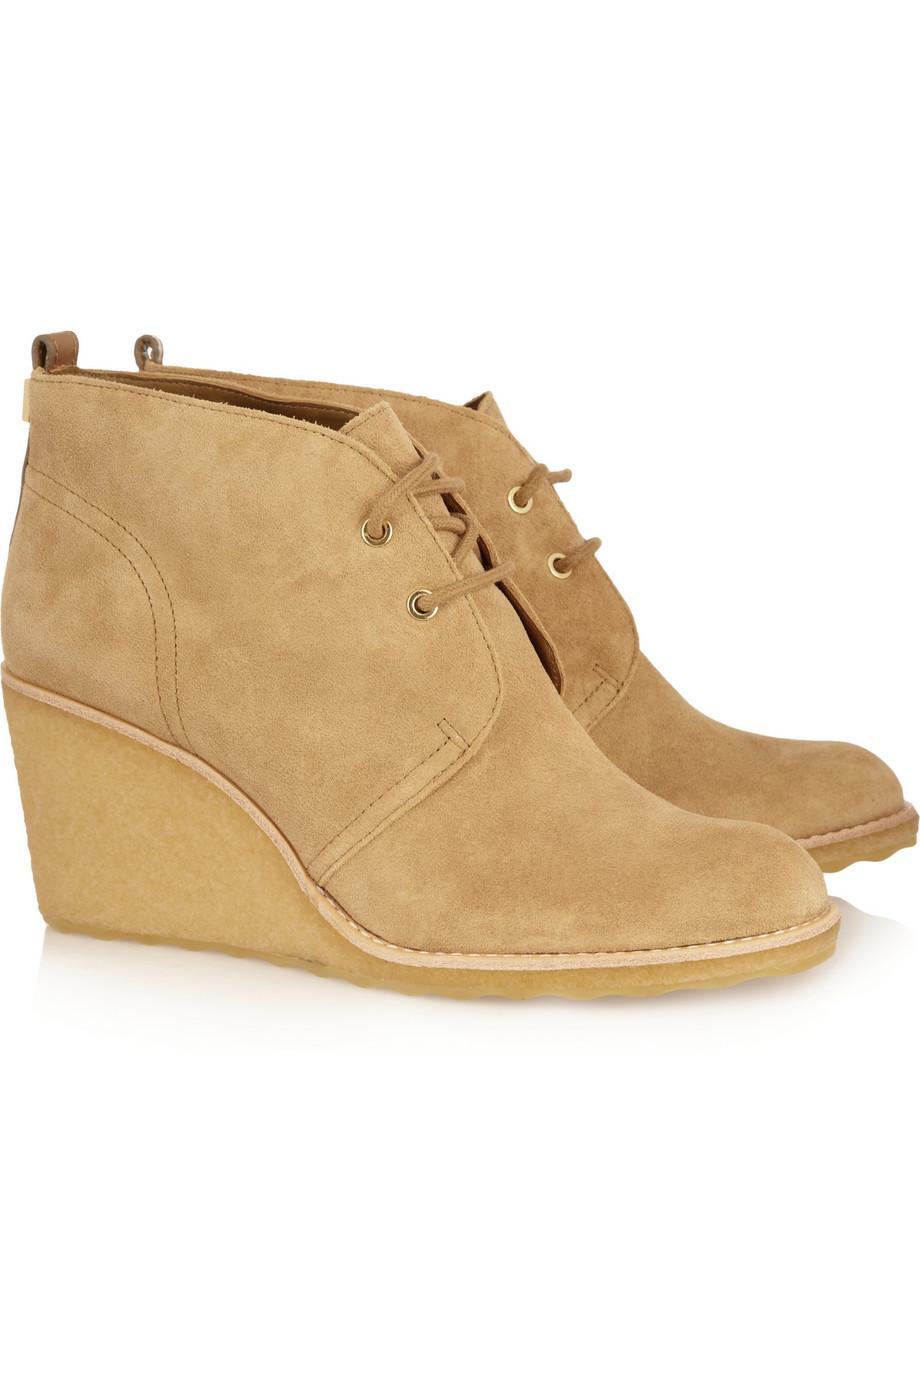 burch vicki suede wedge boots in beige lyst